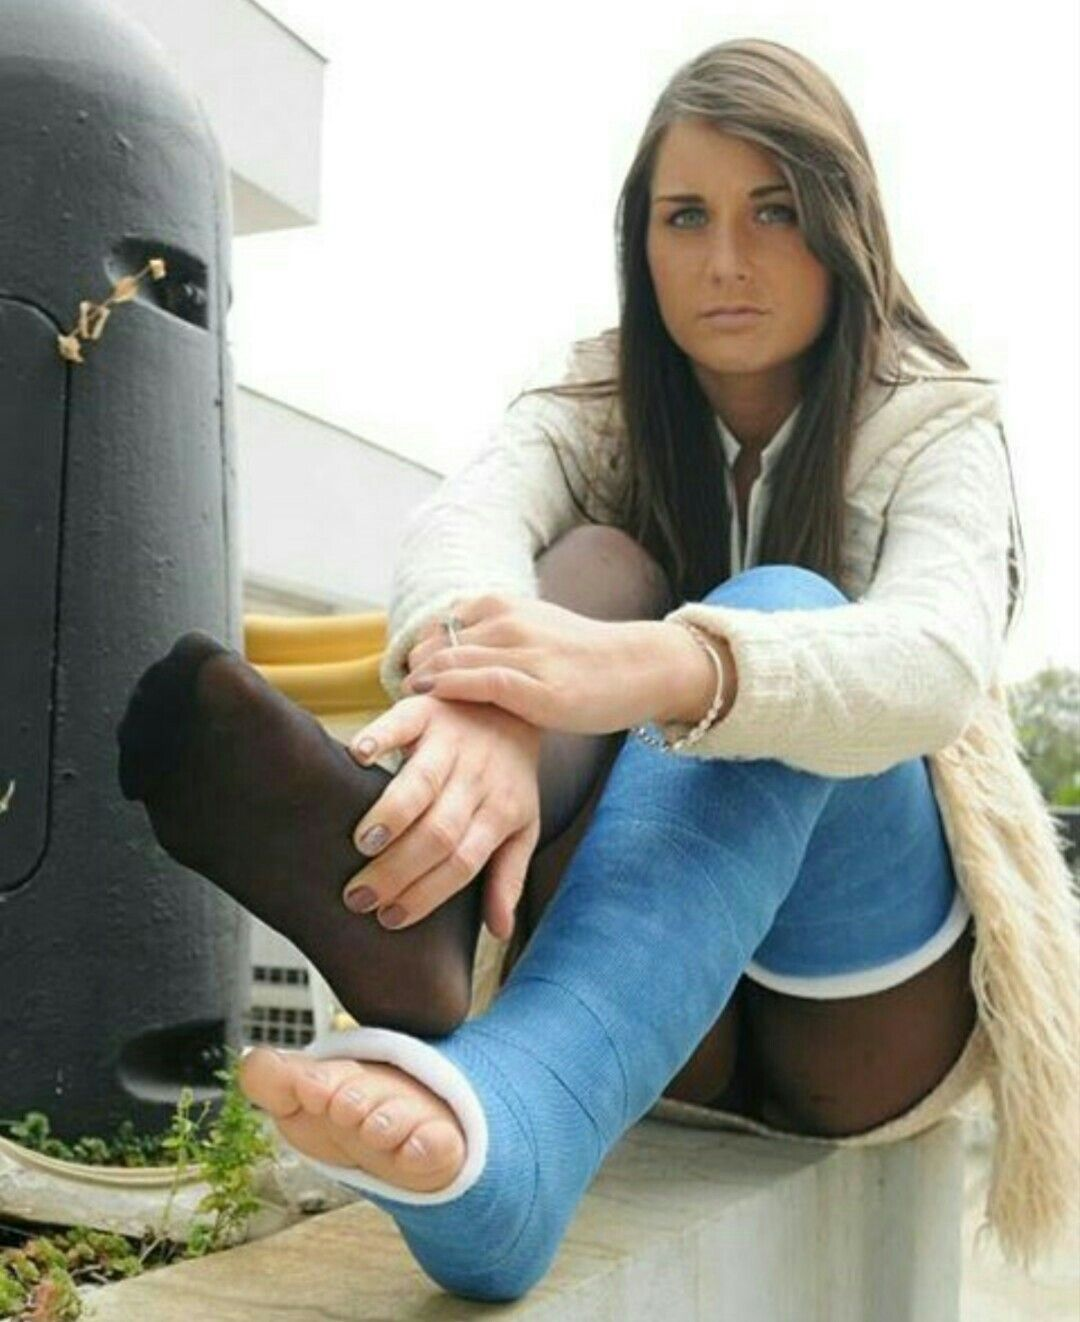 Pin by Alexy Bella on casted it! | Pinterest | Leg cast ...